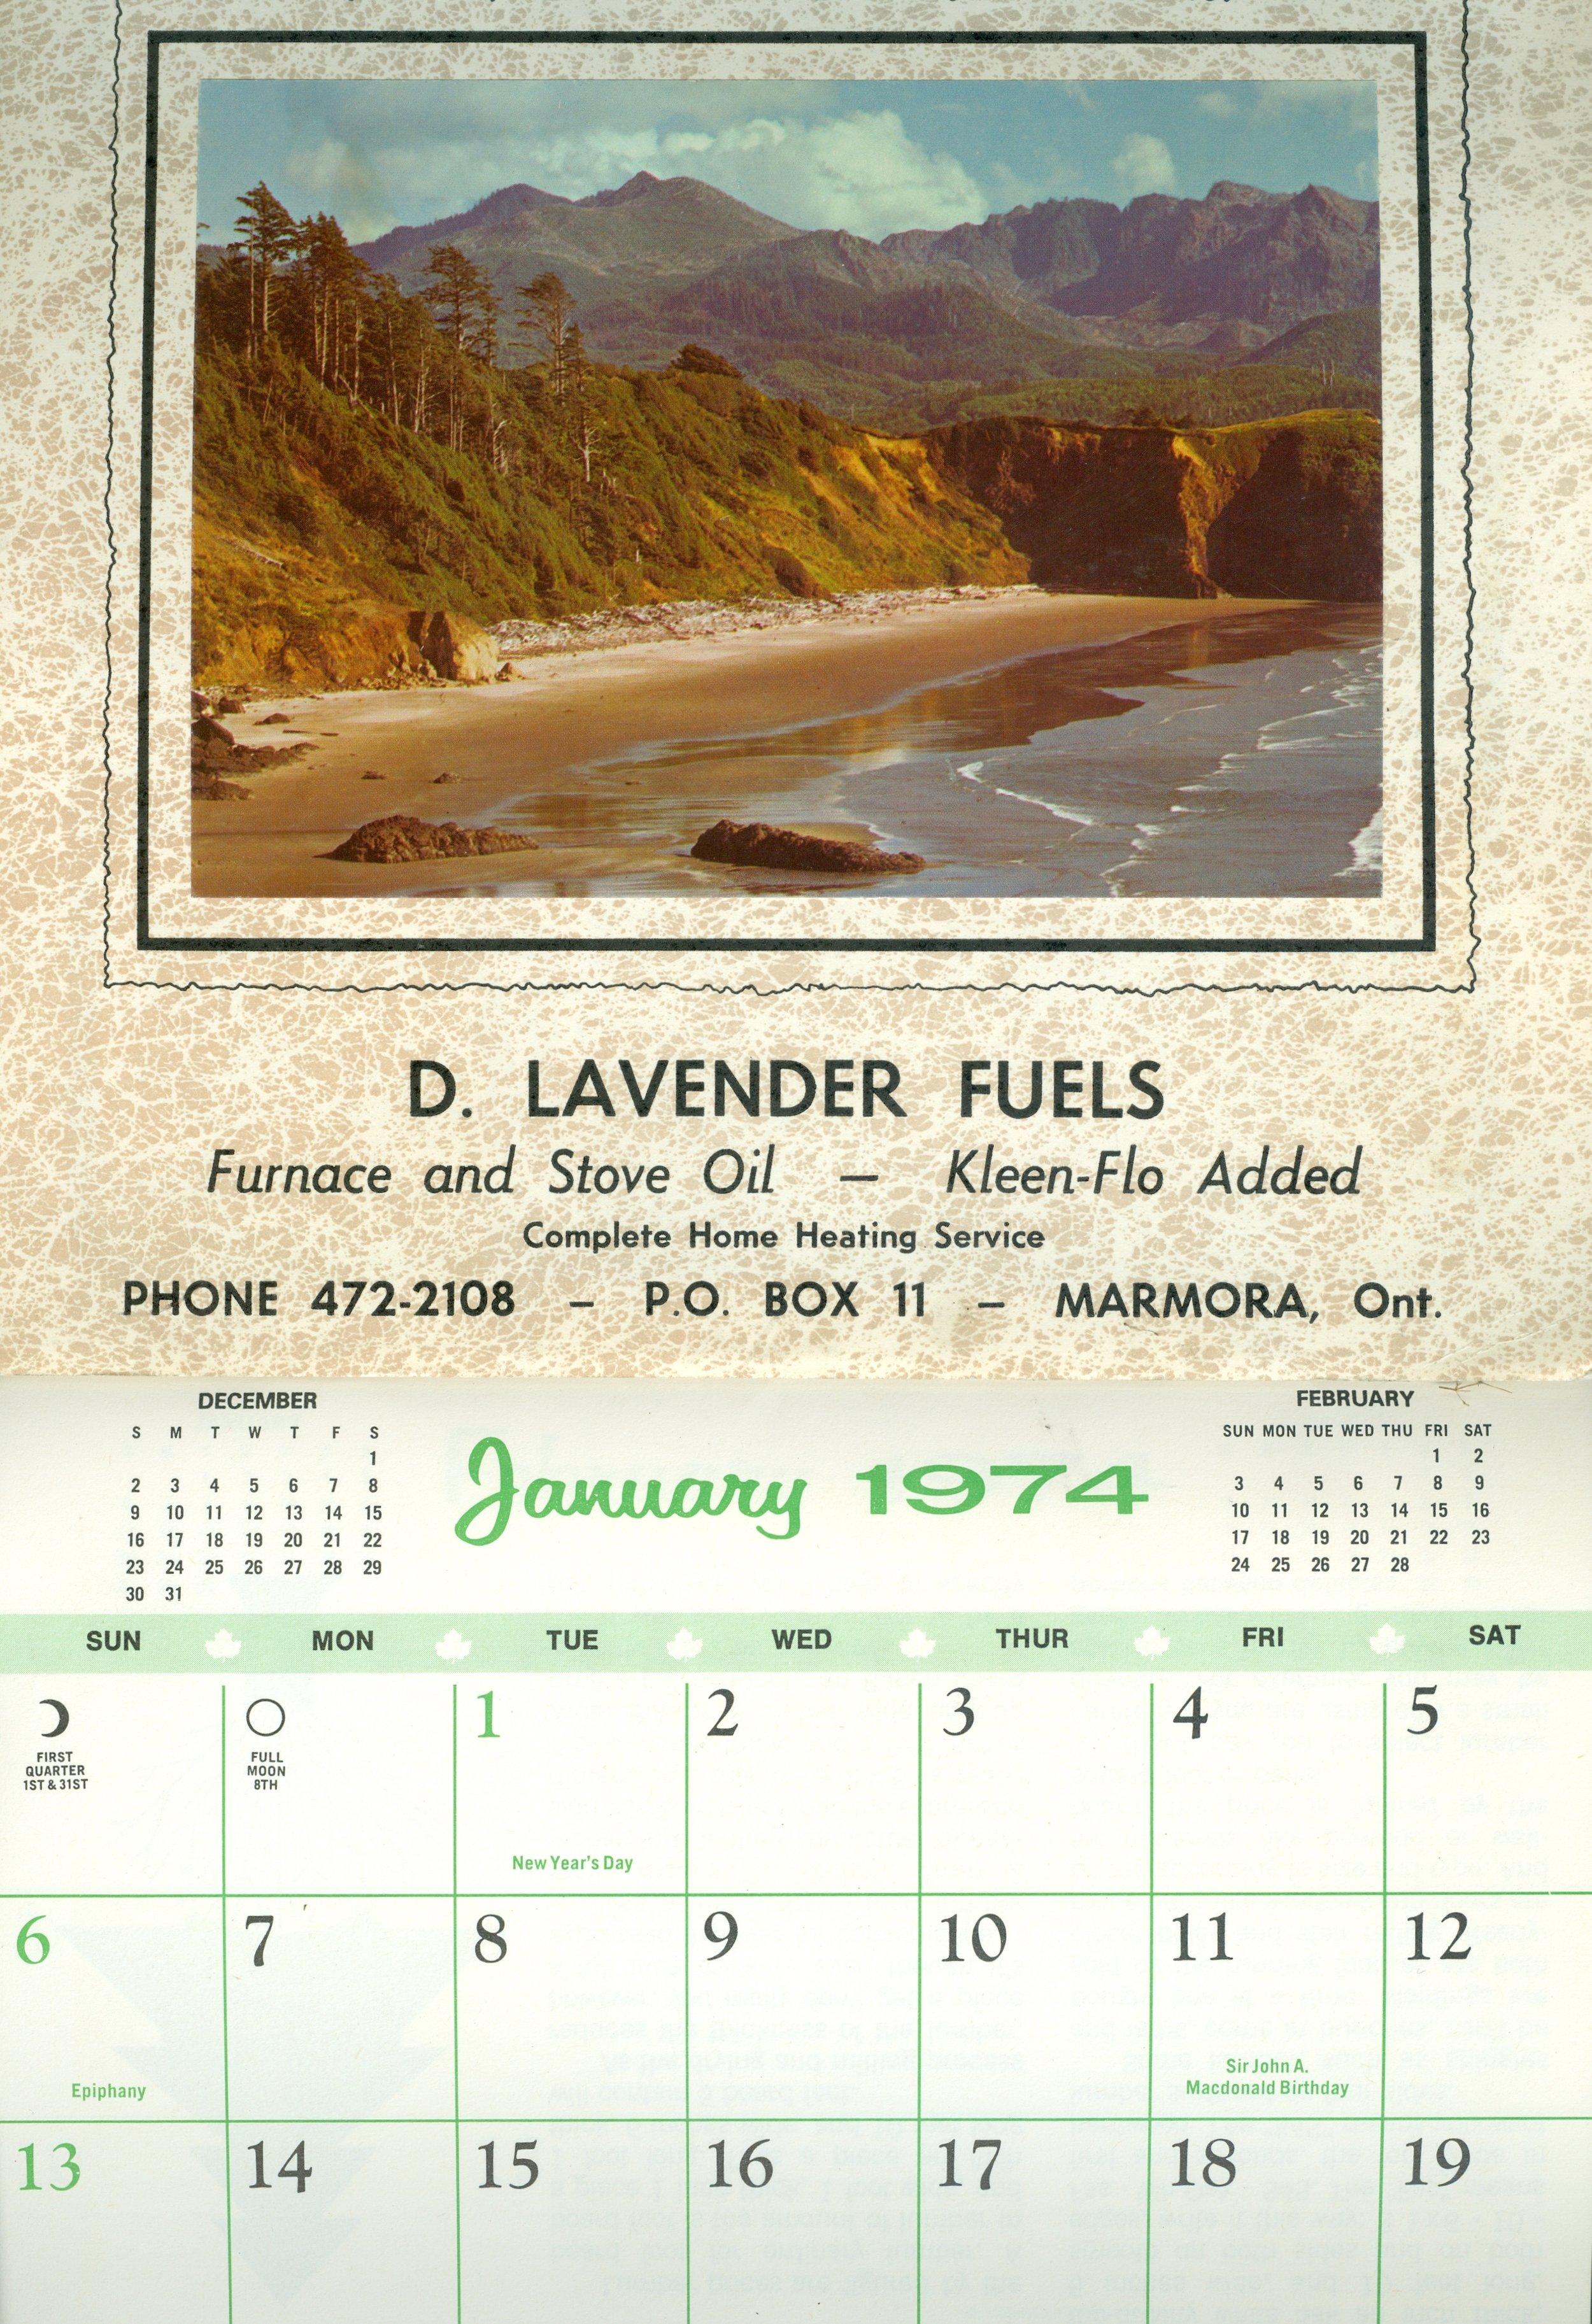 Marmora Business,  D. Lavender Fuels, 1974.jpg